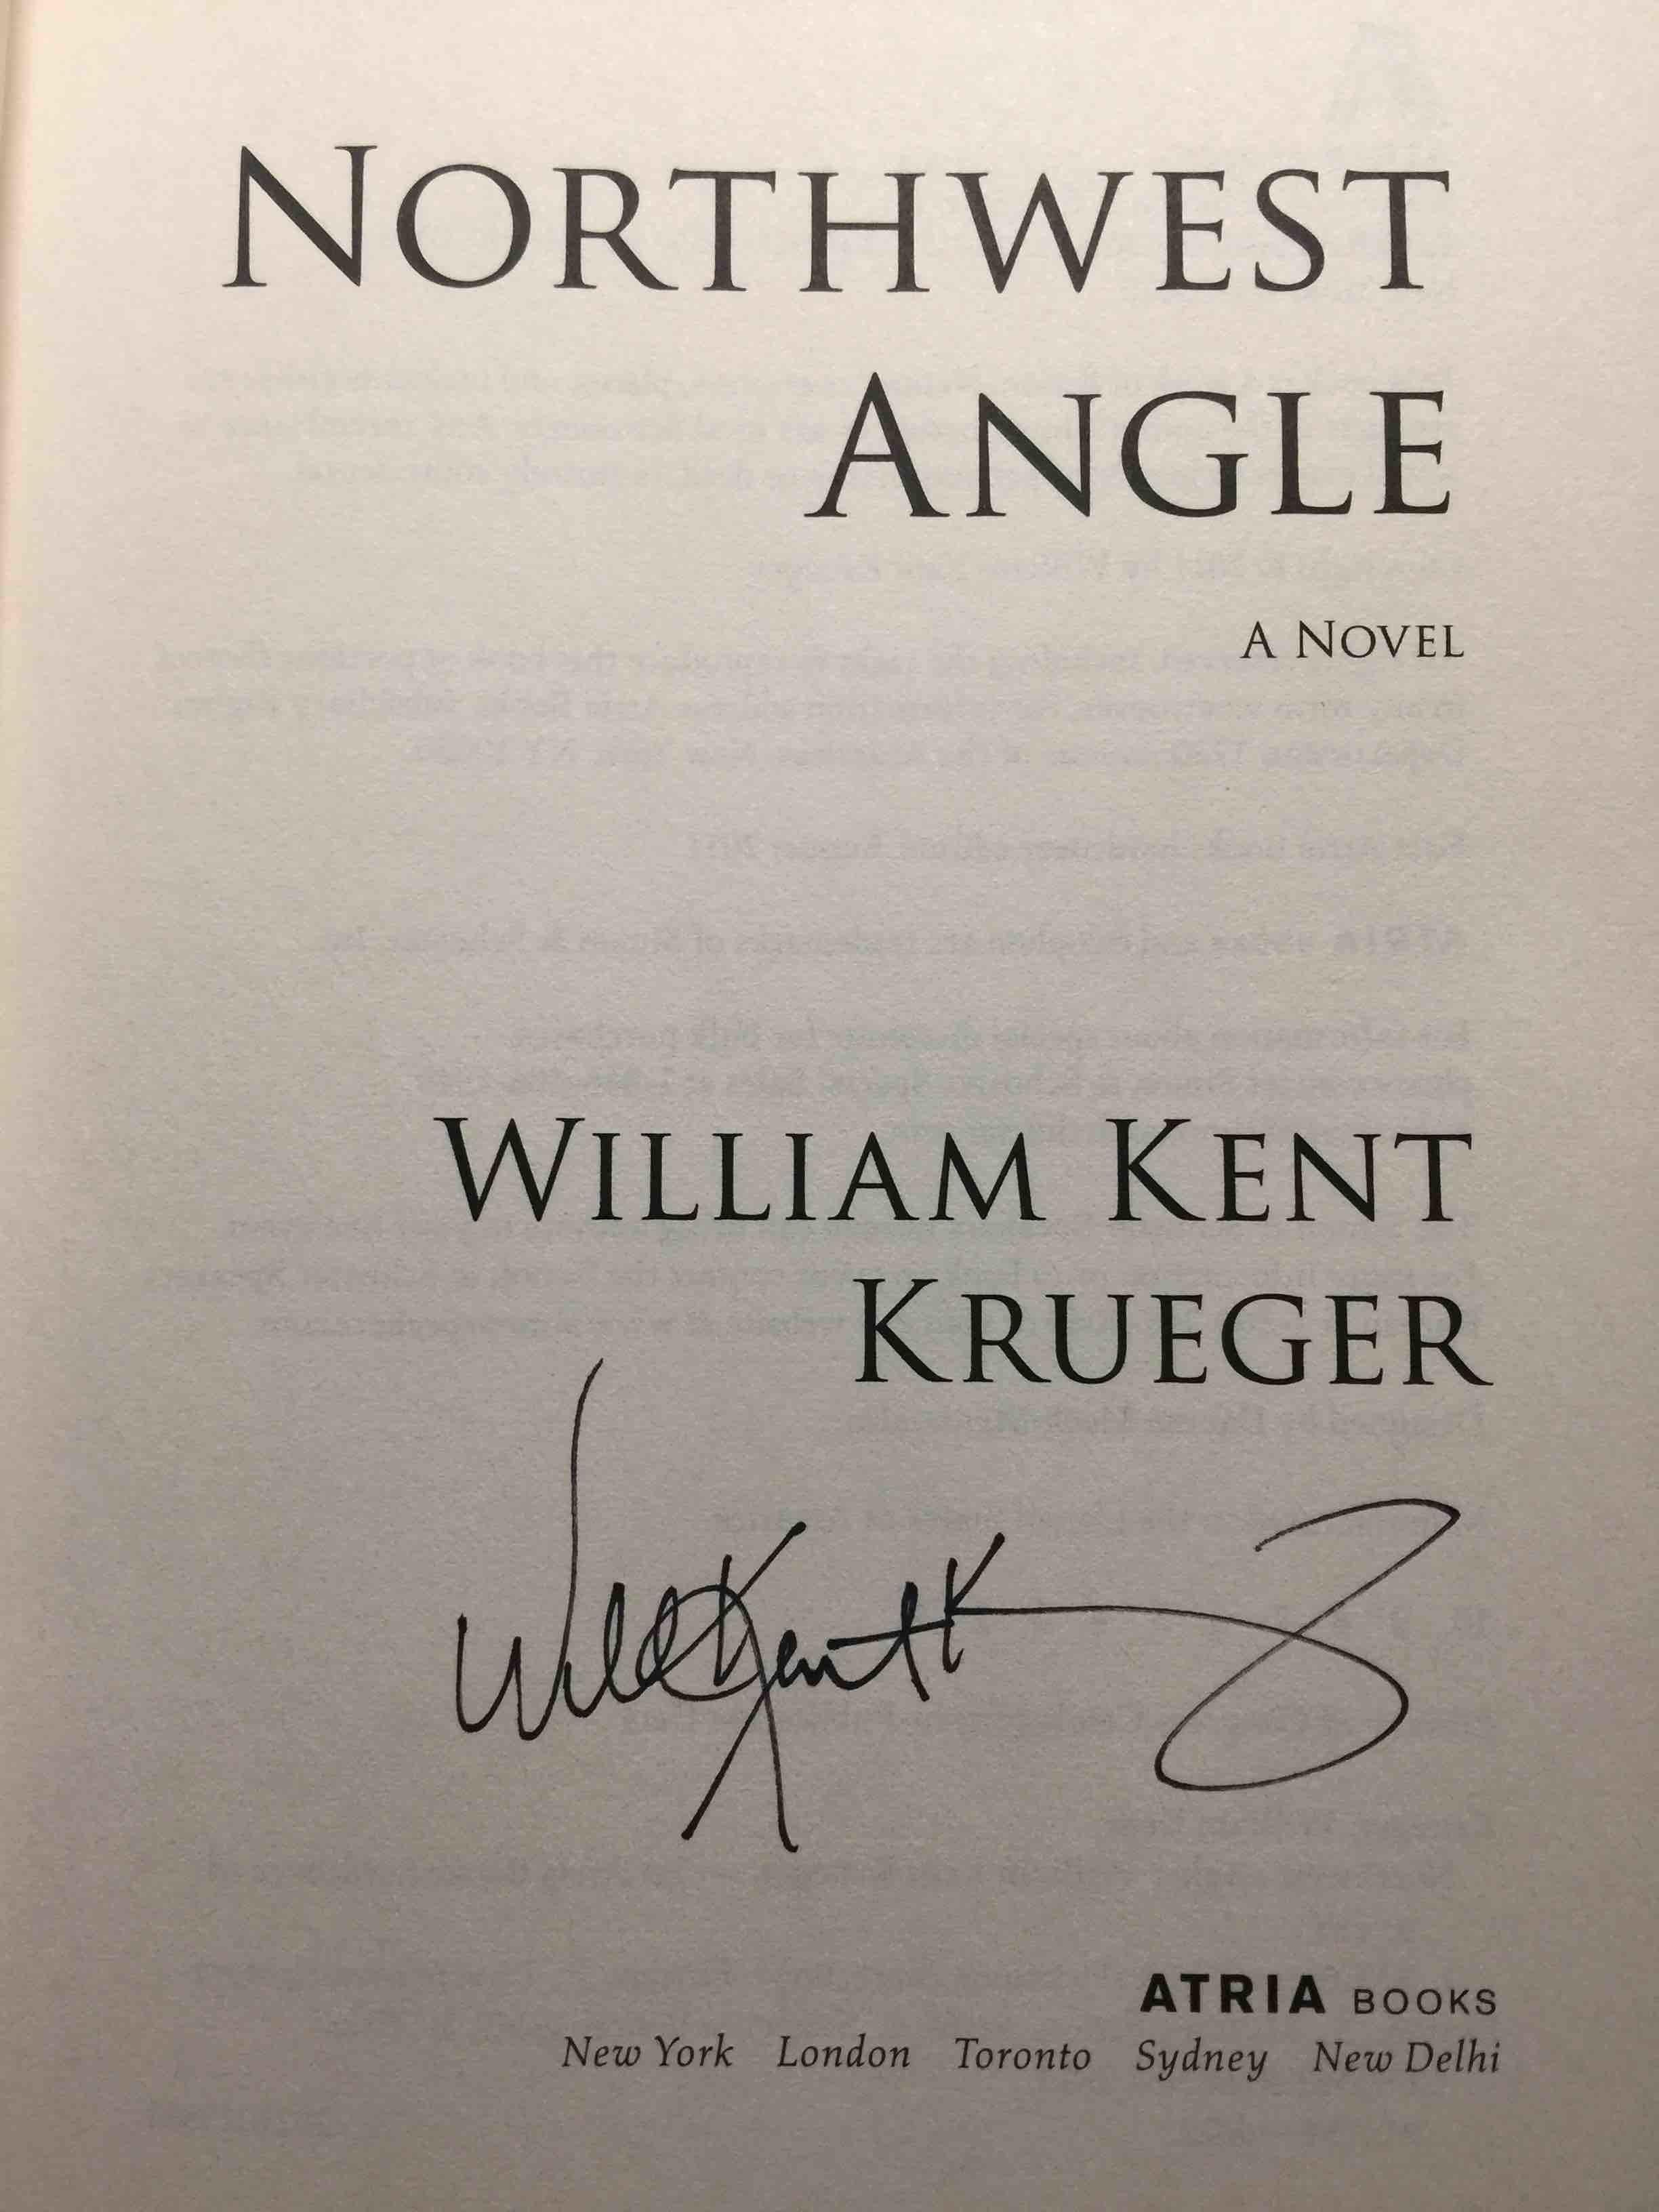 KRUEGER, WILLIAM KENT. - NORTHWEST ANGLE.